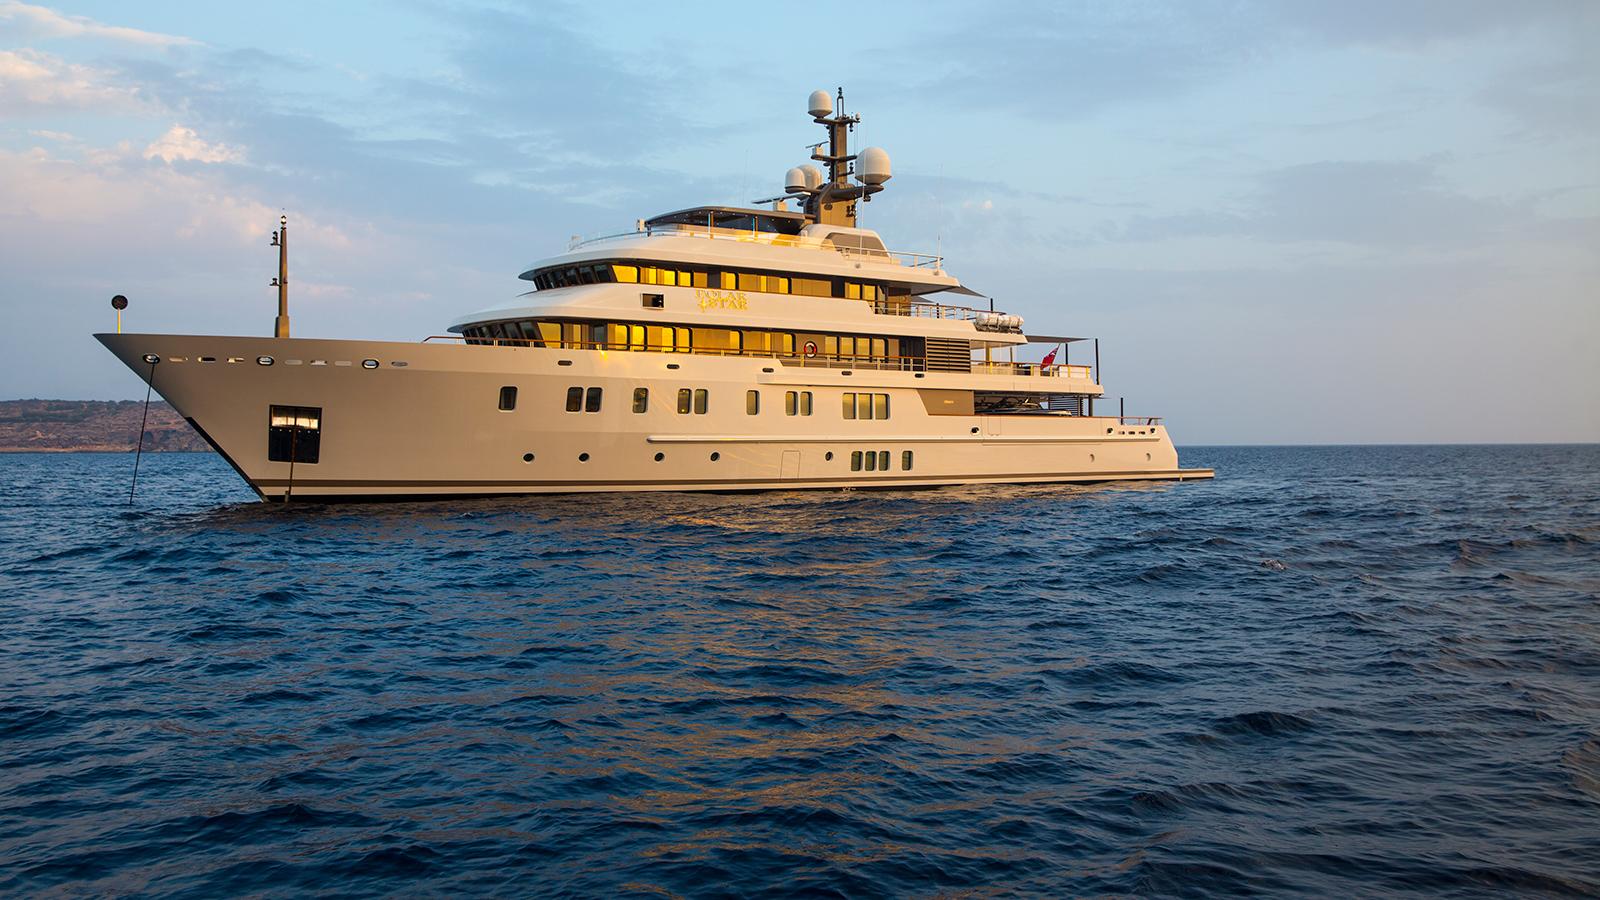 side-view-of-the-lurssen-superyacht-polar-star